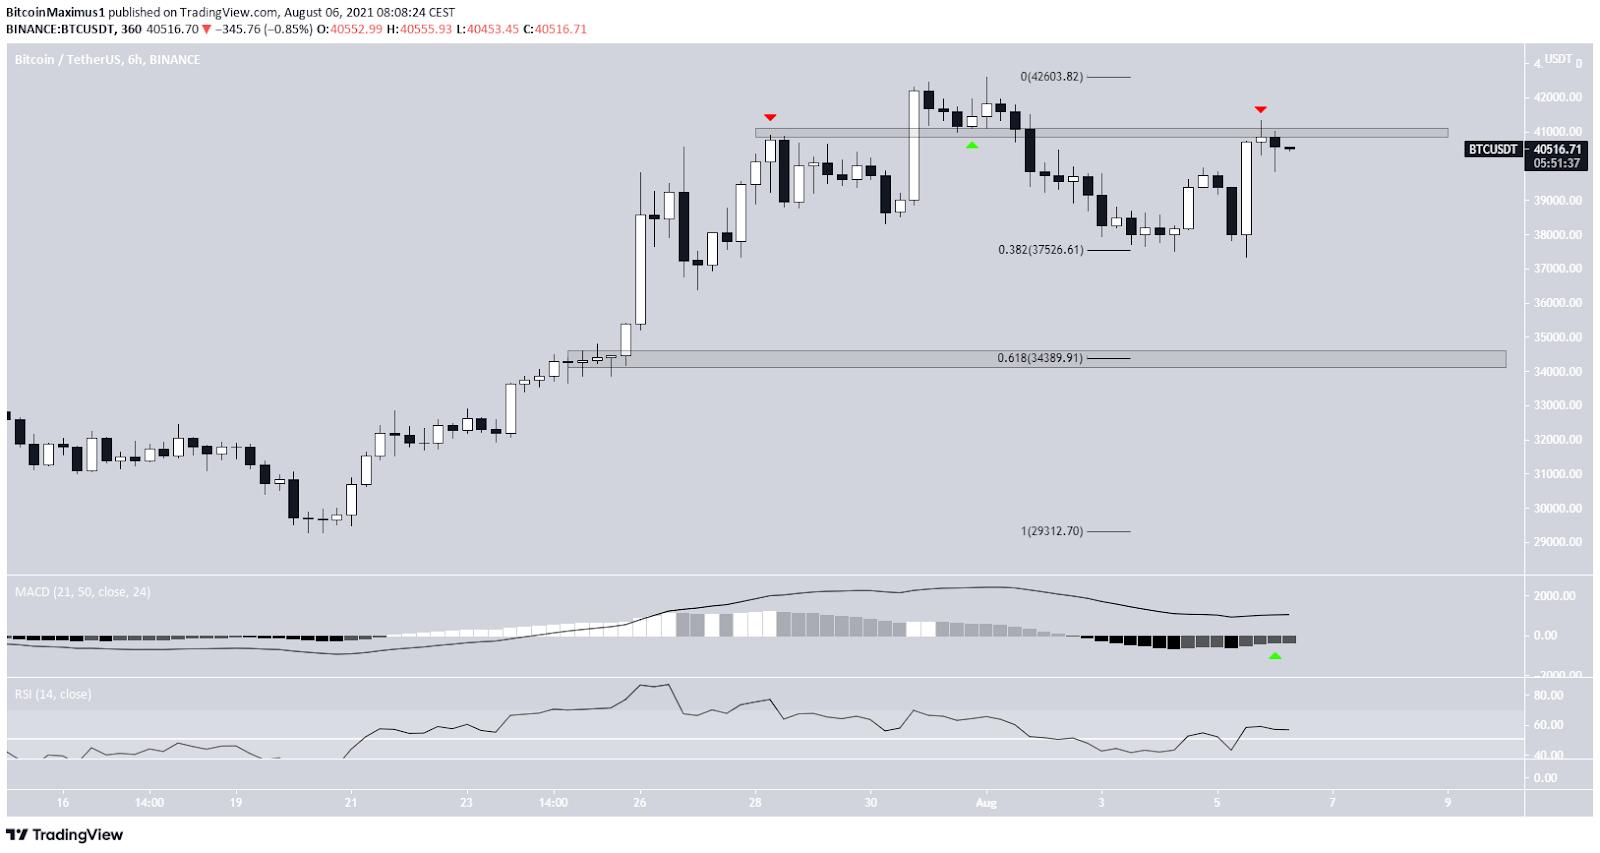 Bitcoin Preis Kurs BTC 6-Stunden-Chart 06.08.2021 Wellenanalyse